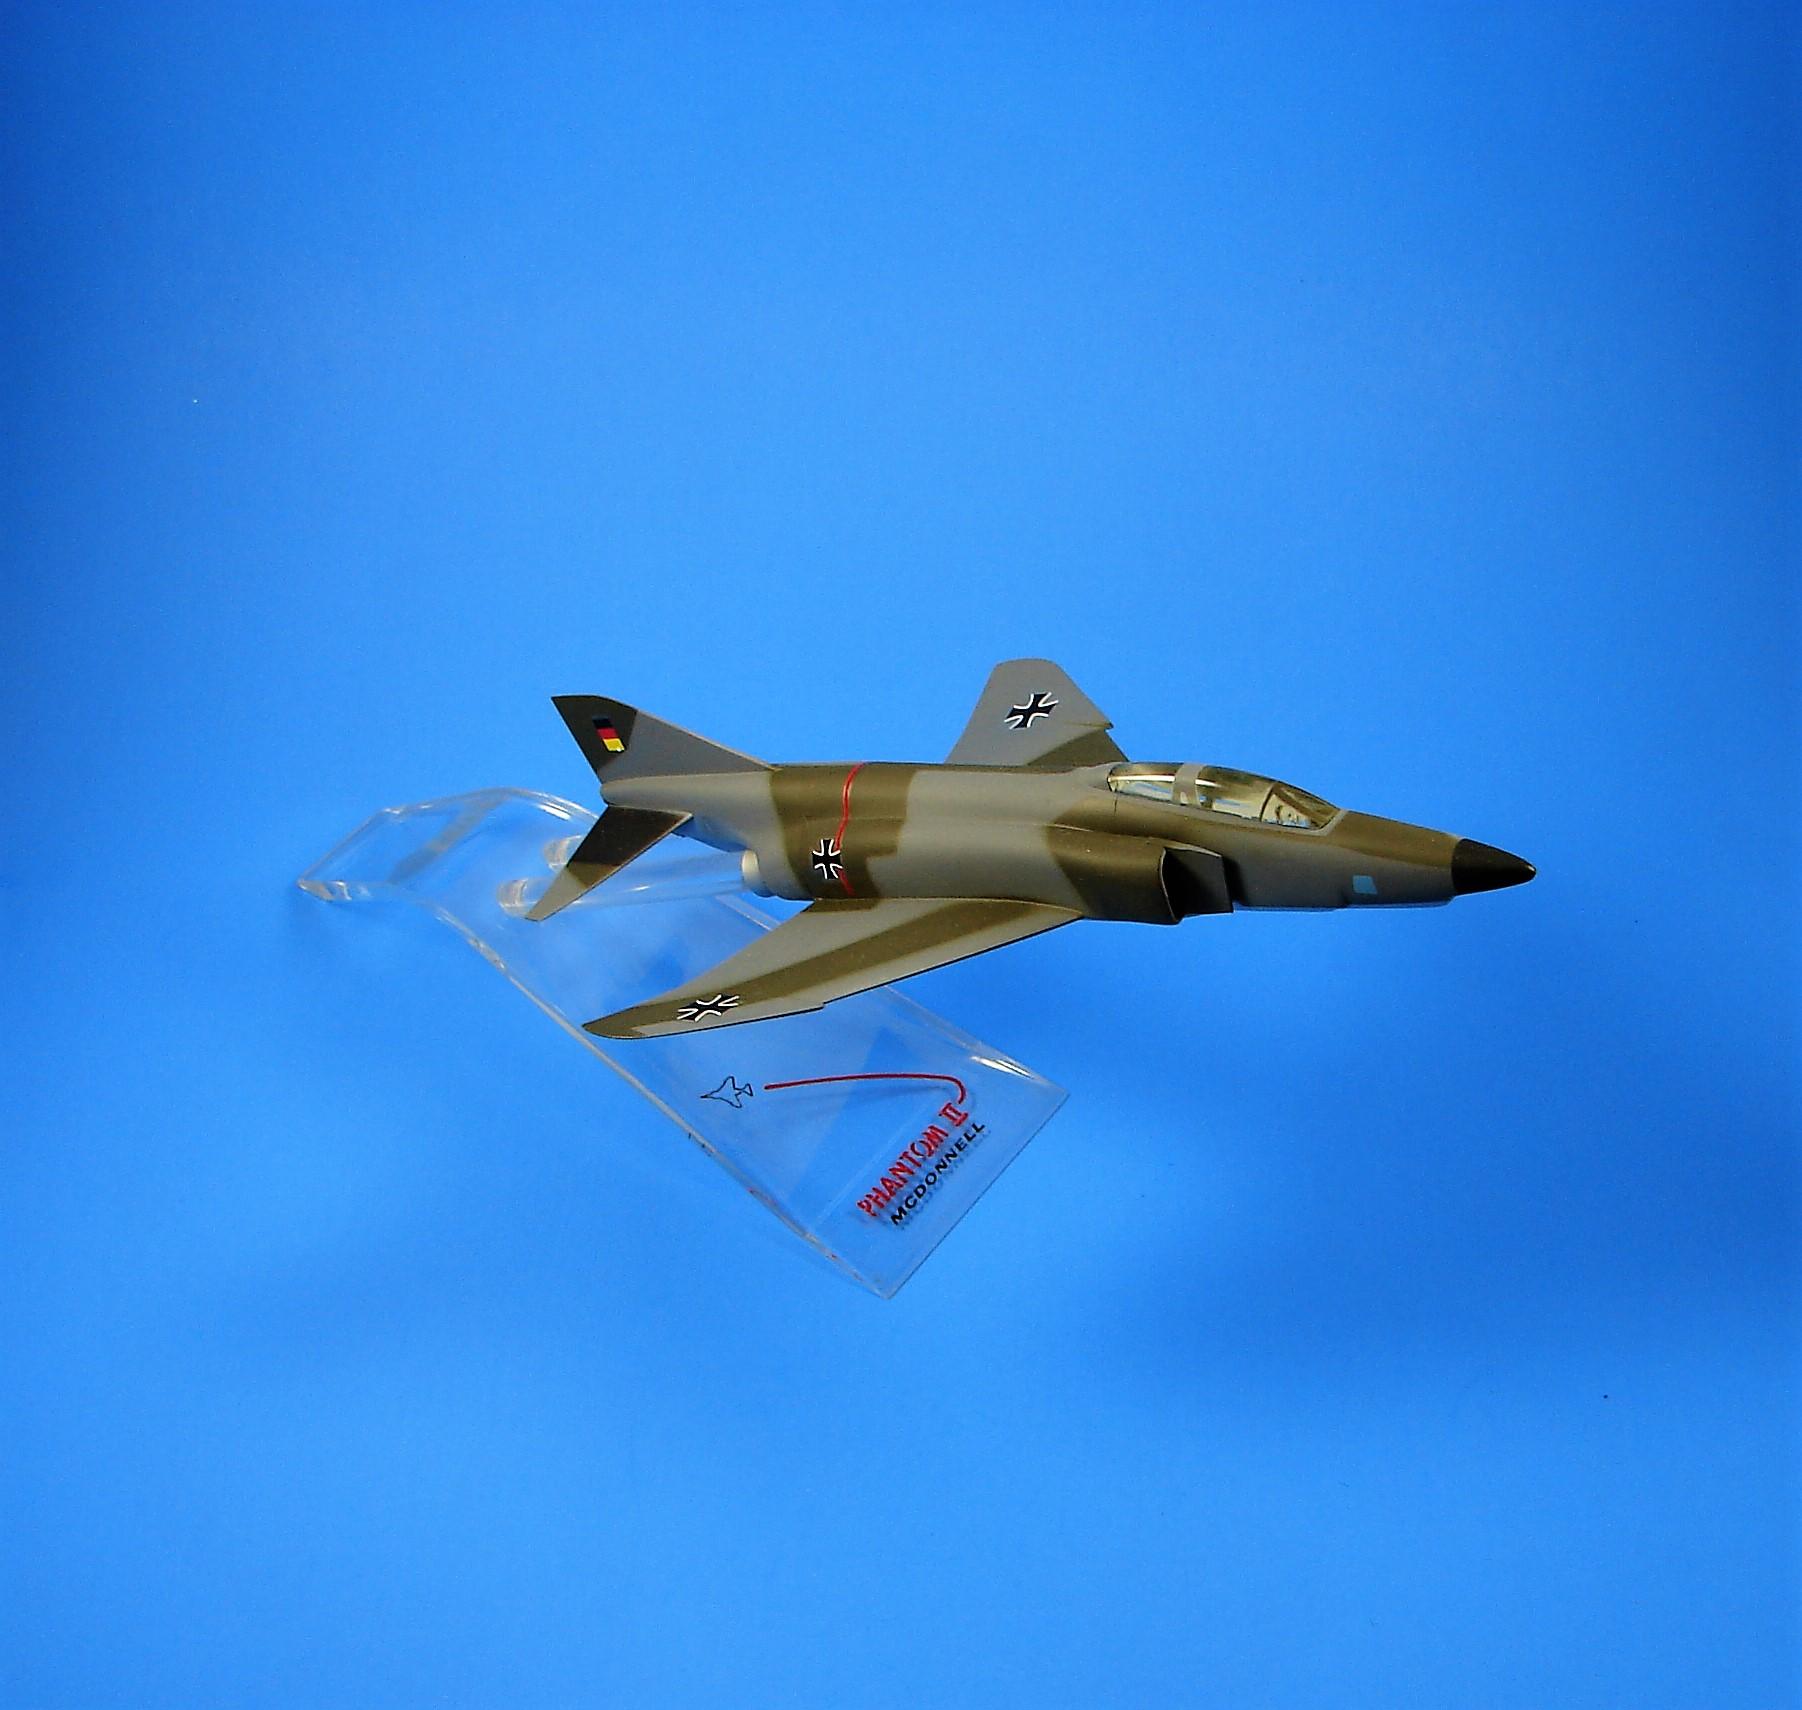 McDonnell RF-4 German